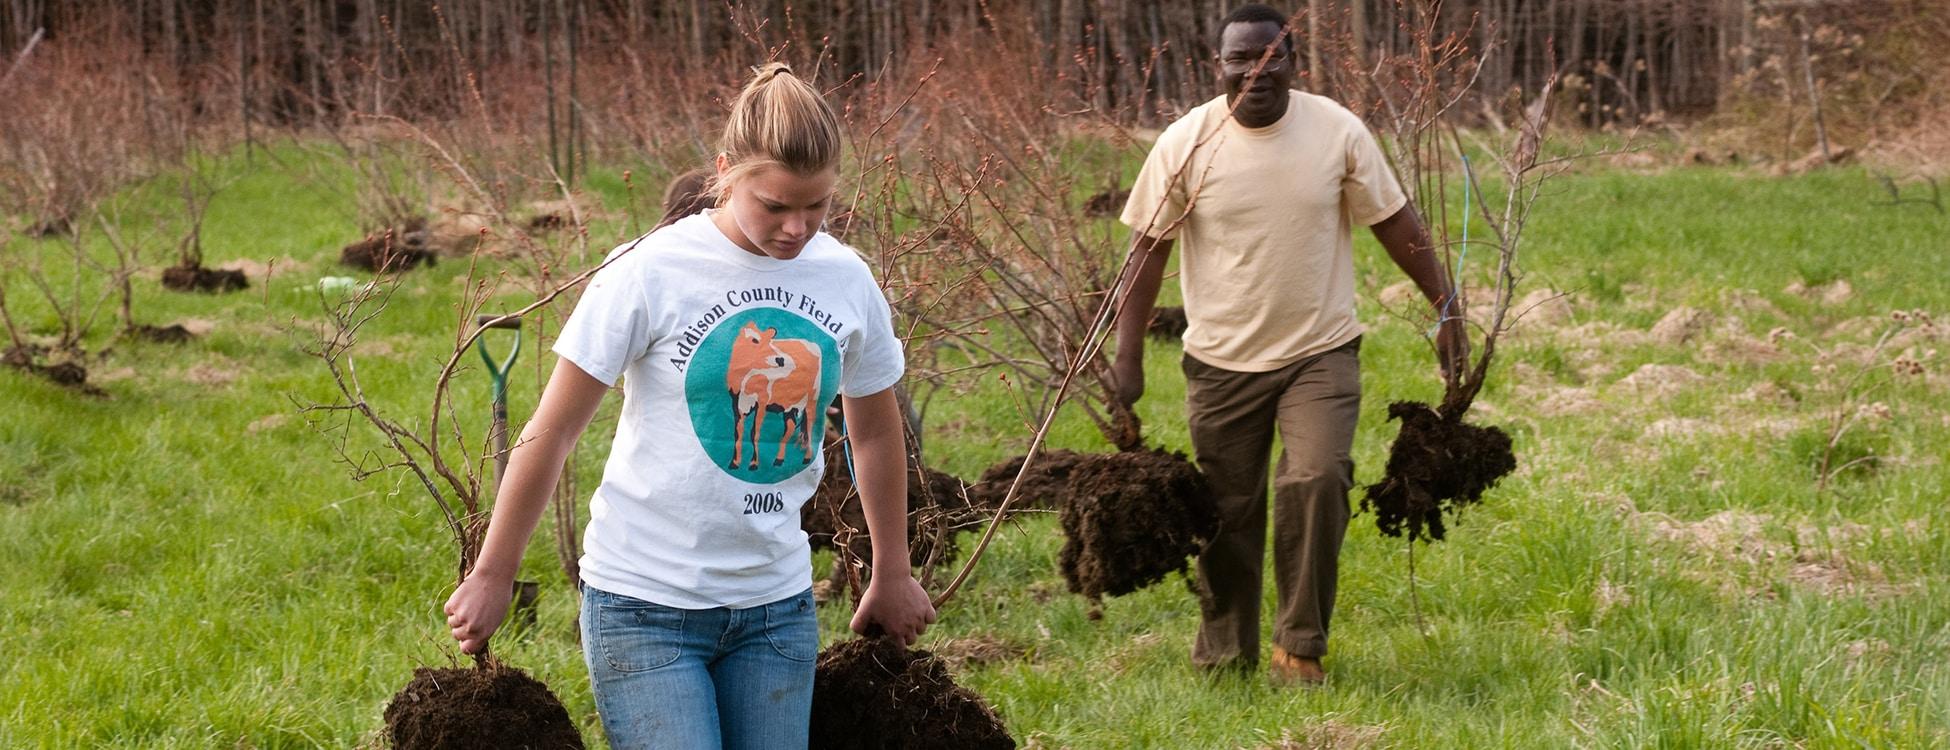 Planting blueberry bushes, diversity, outside